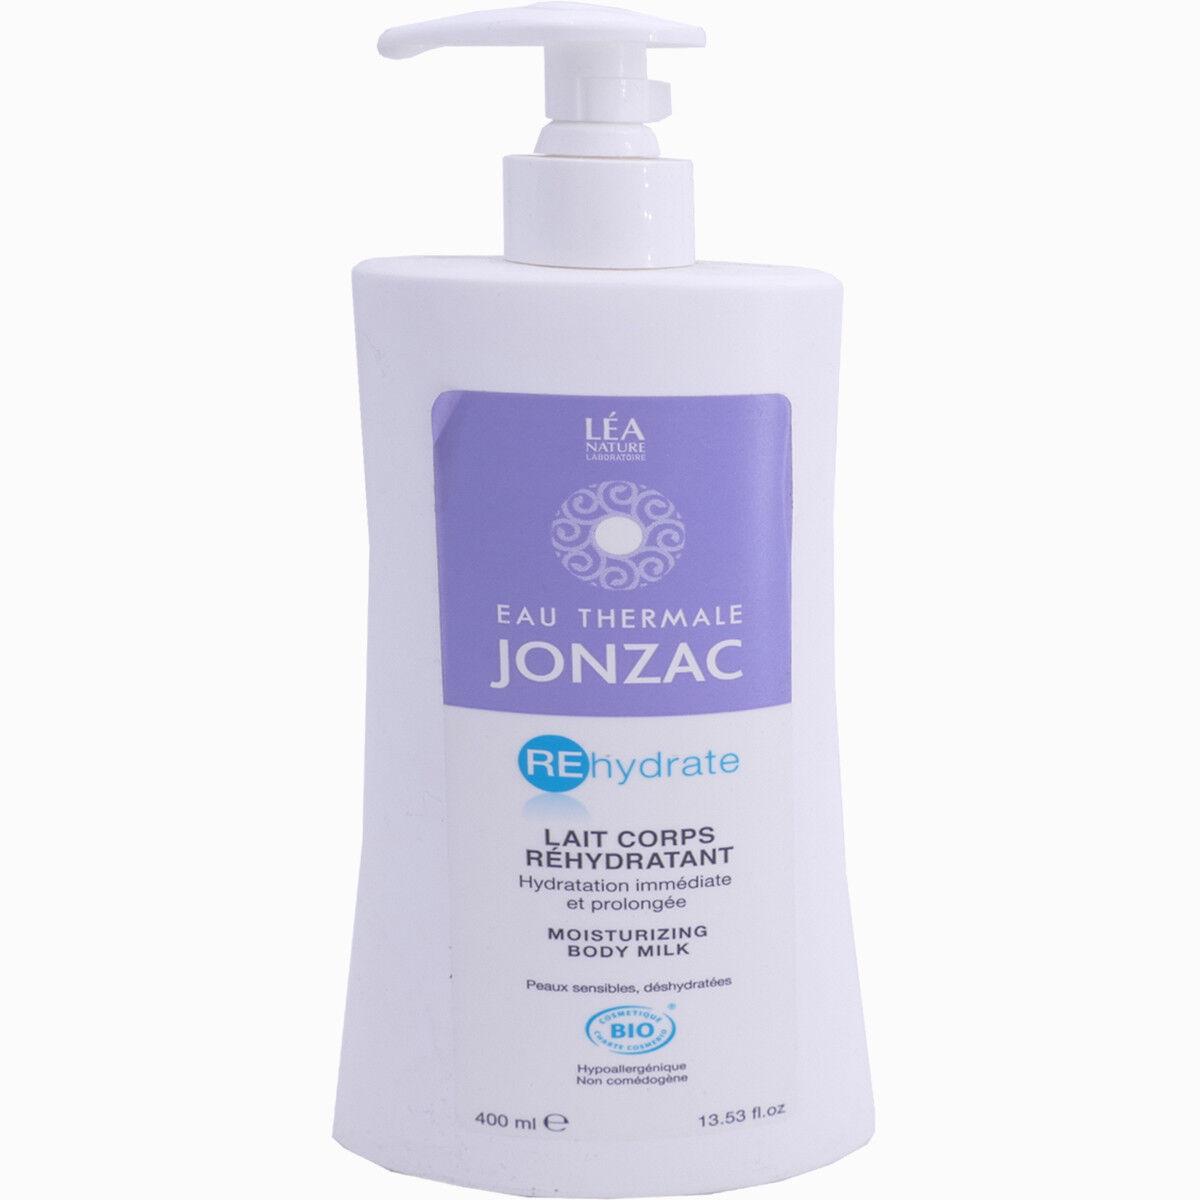 Jonzac rehydrate lait corps bio 400 ml